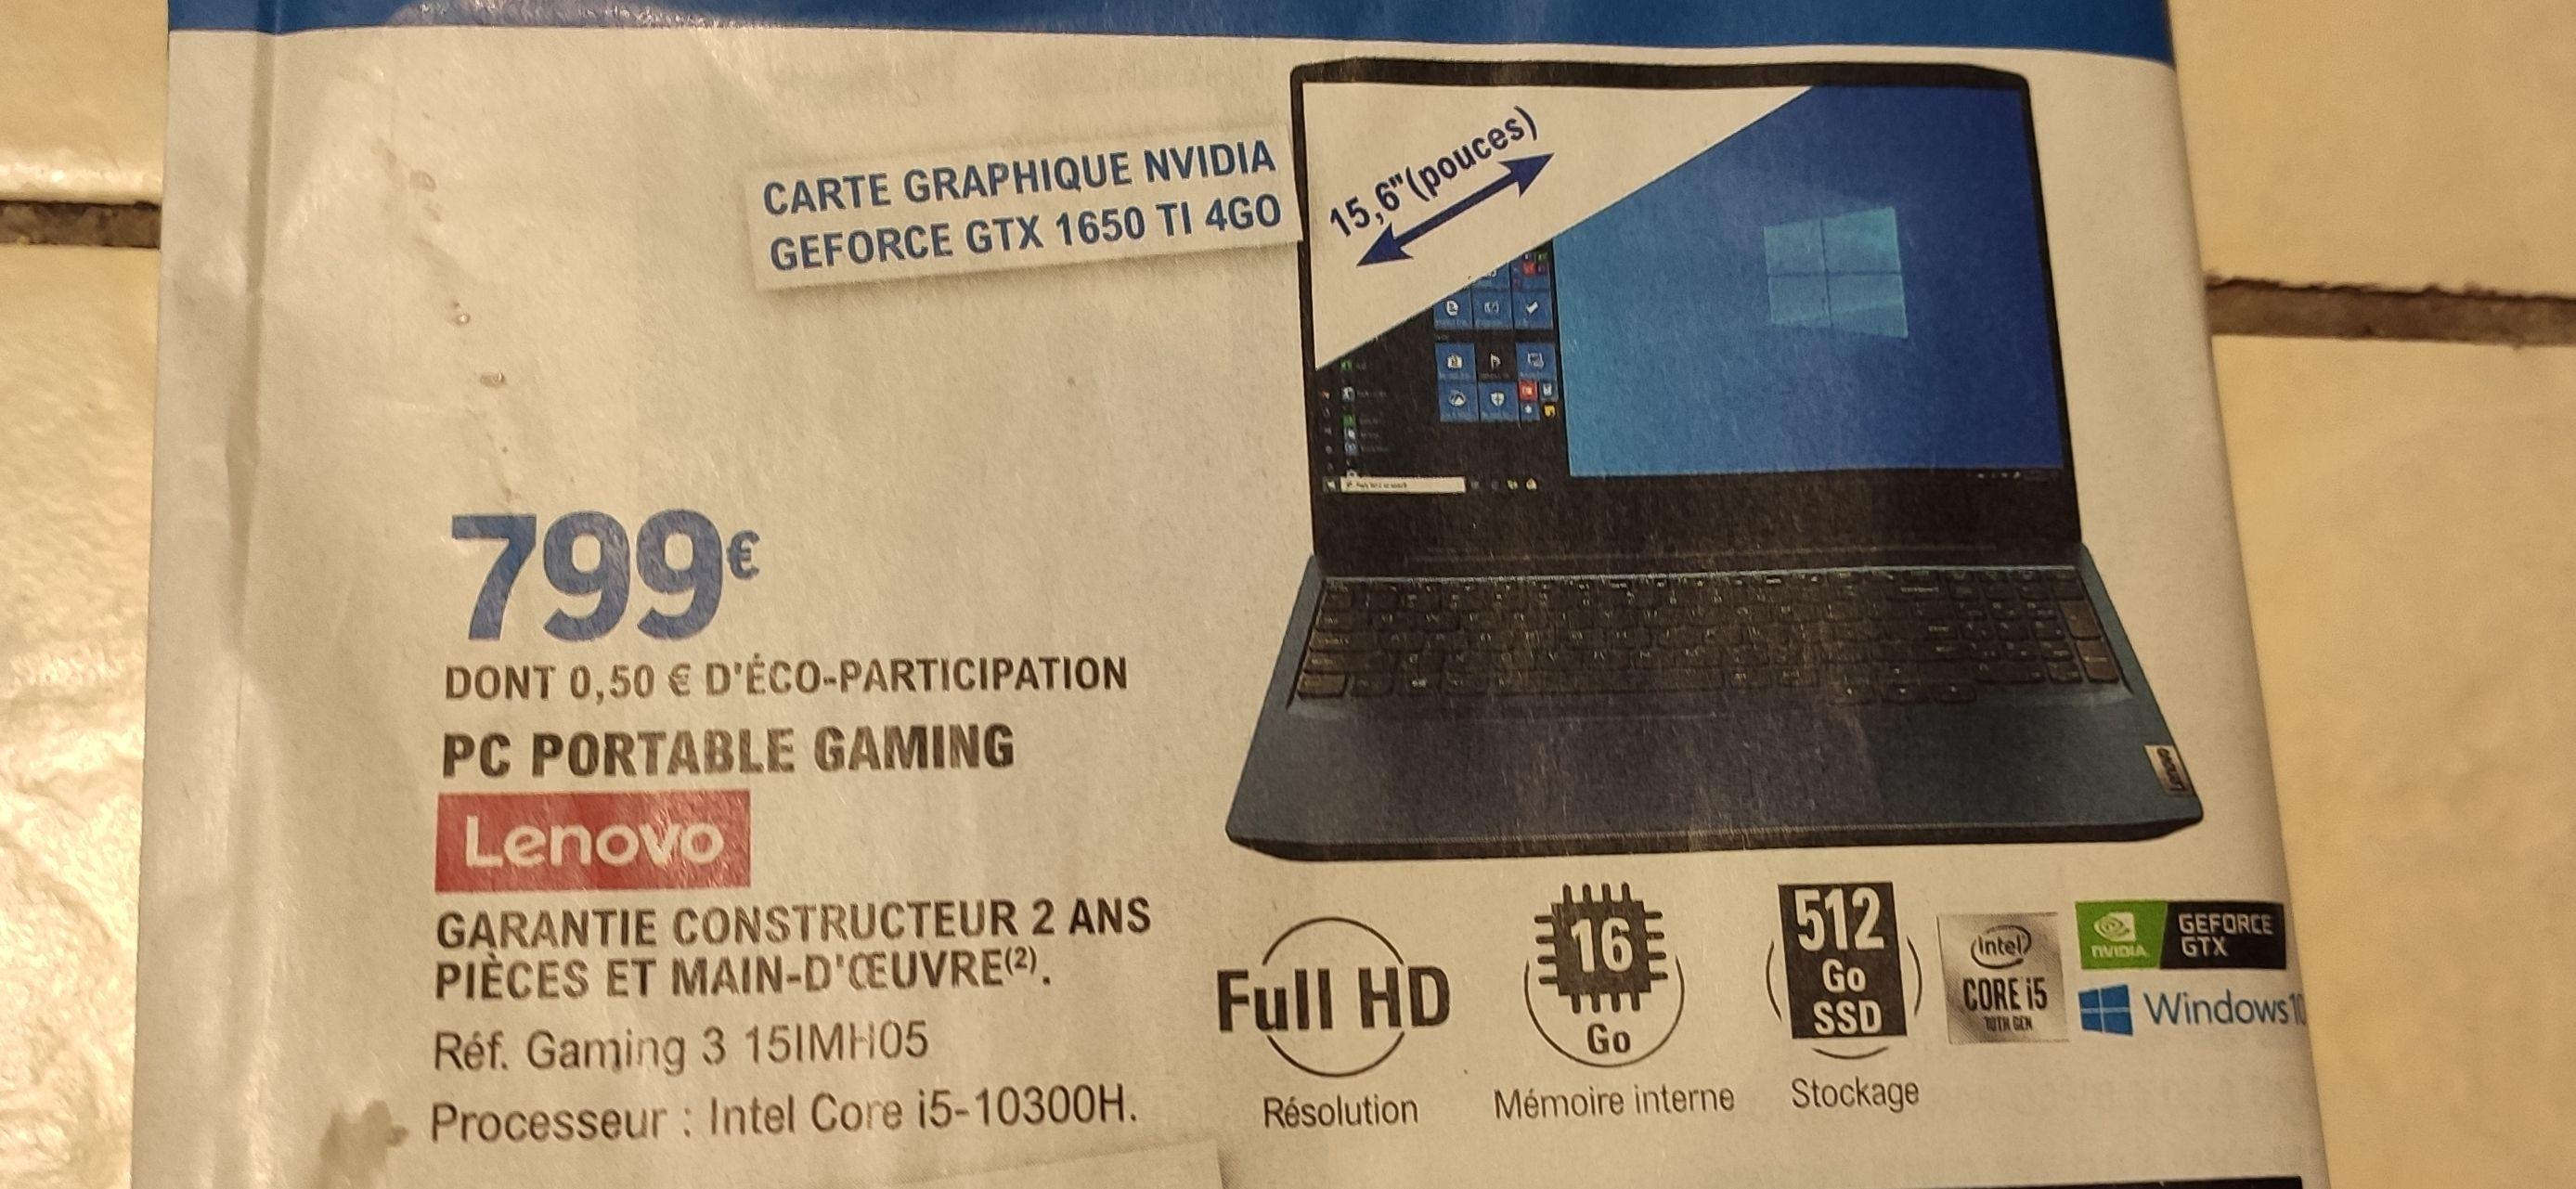 "PC Portable 15.6"" Lenovo IdeaPad Gaming 3 15IMH05 - Full HD 120 Hz, i5-10300H, RAM 16 Go, GTX 1650 Ti, Windows 10"